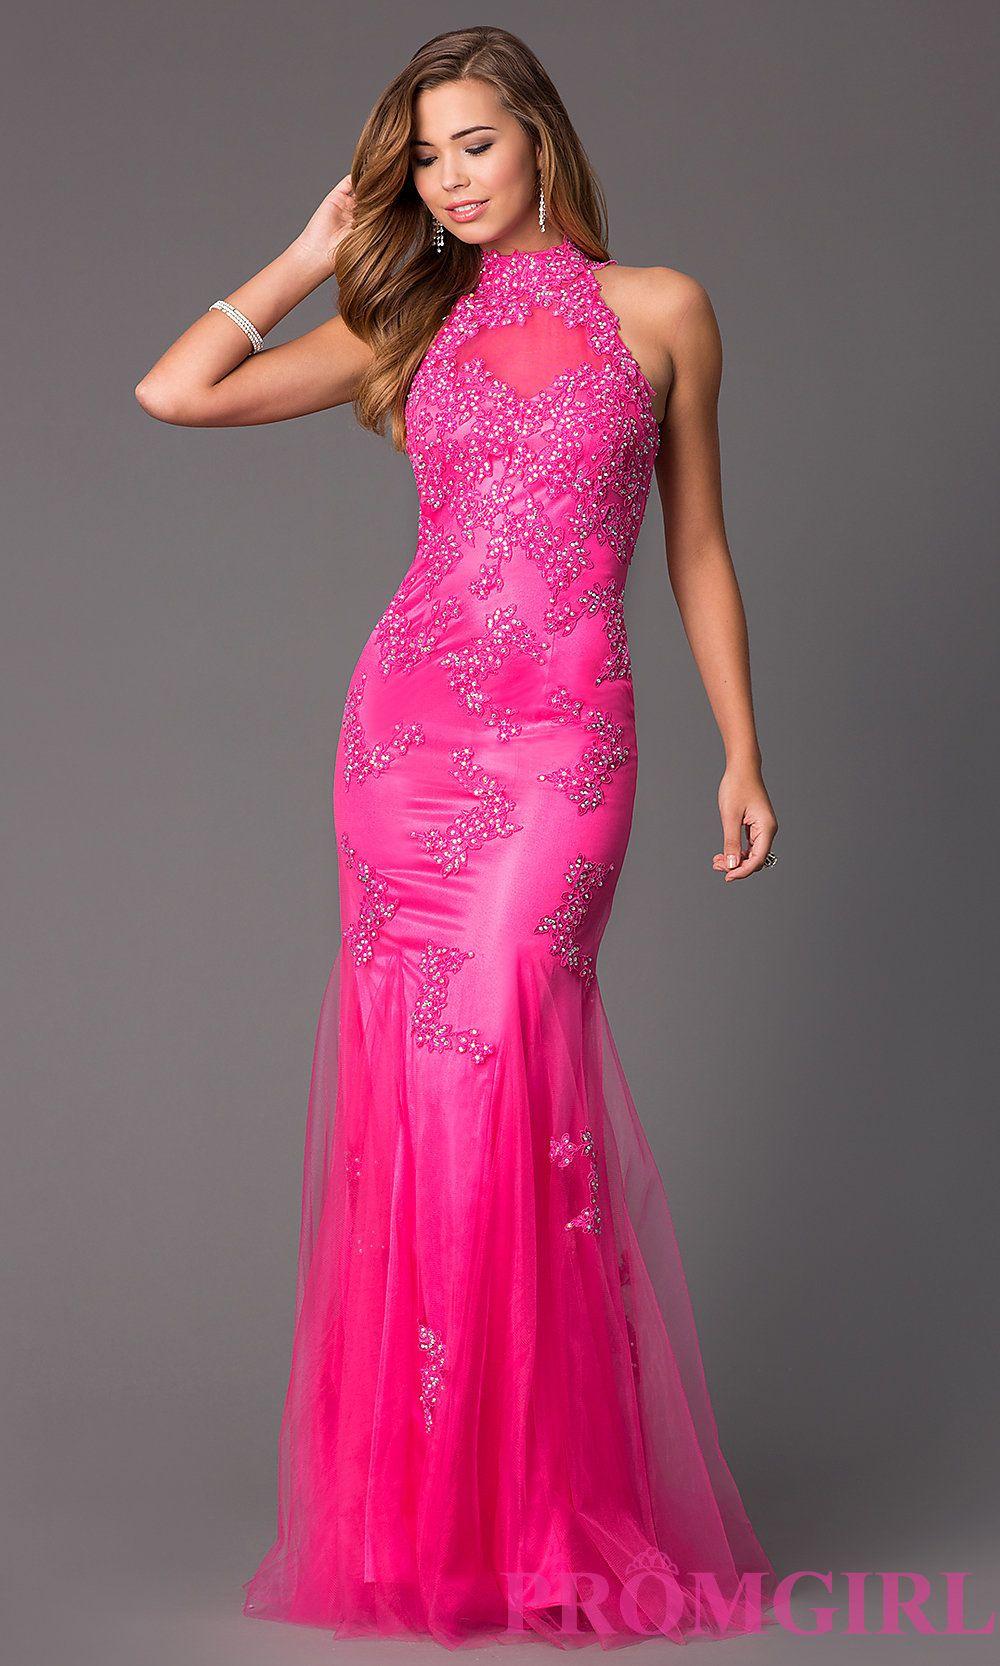 swatch_attribute_584691 | modern | Pinterest | Embellished dress ...